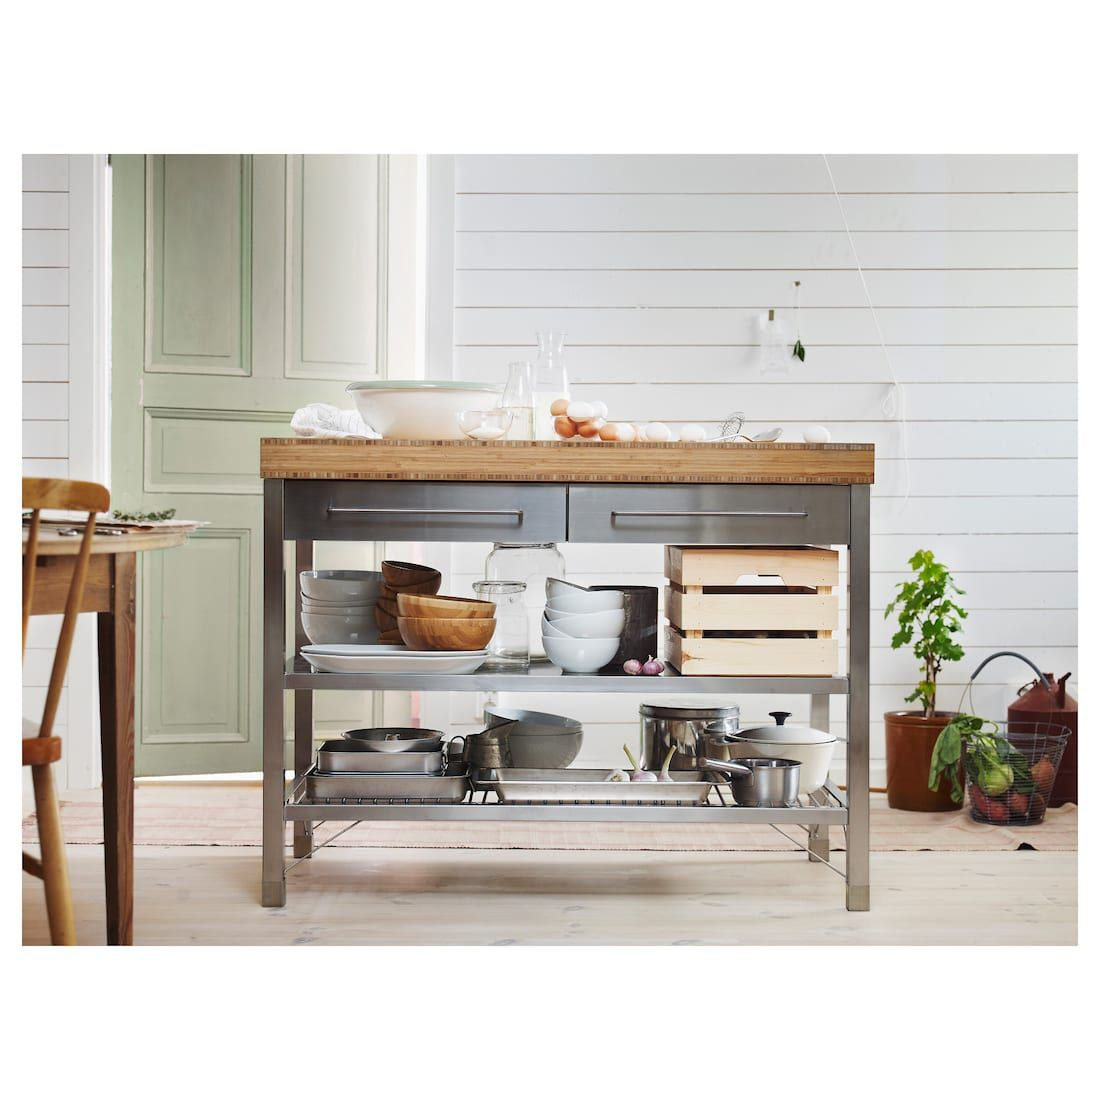 Rimforsa Work Bench Stainless Steel Bamboo Ikea Ikea Kitchen Island Kitchen Island Ikea Hack Kitchen Furniture